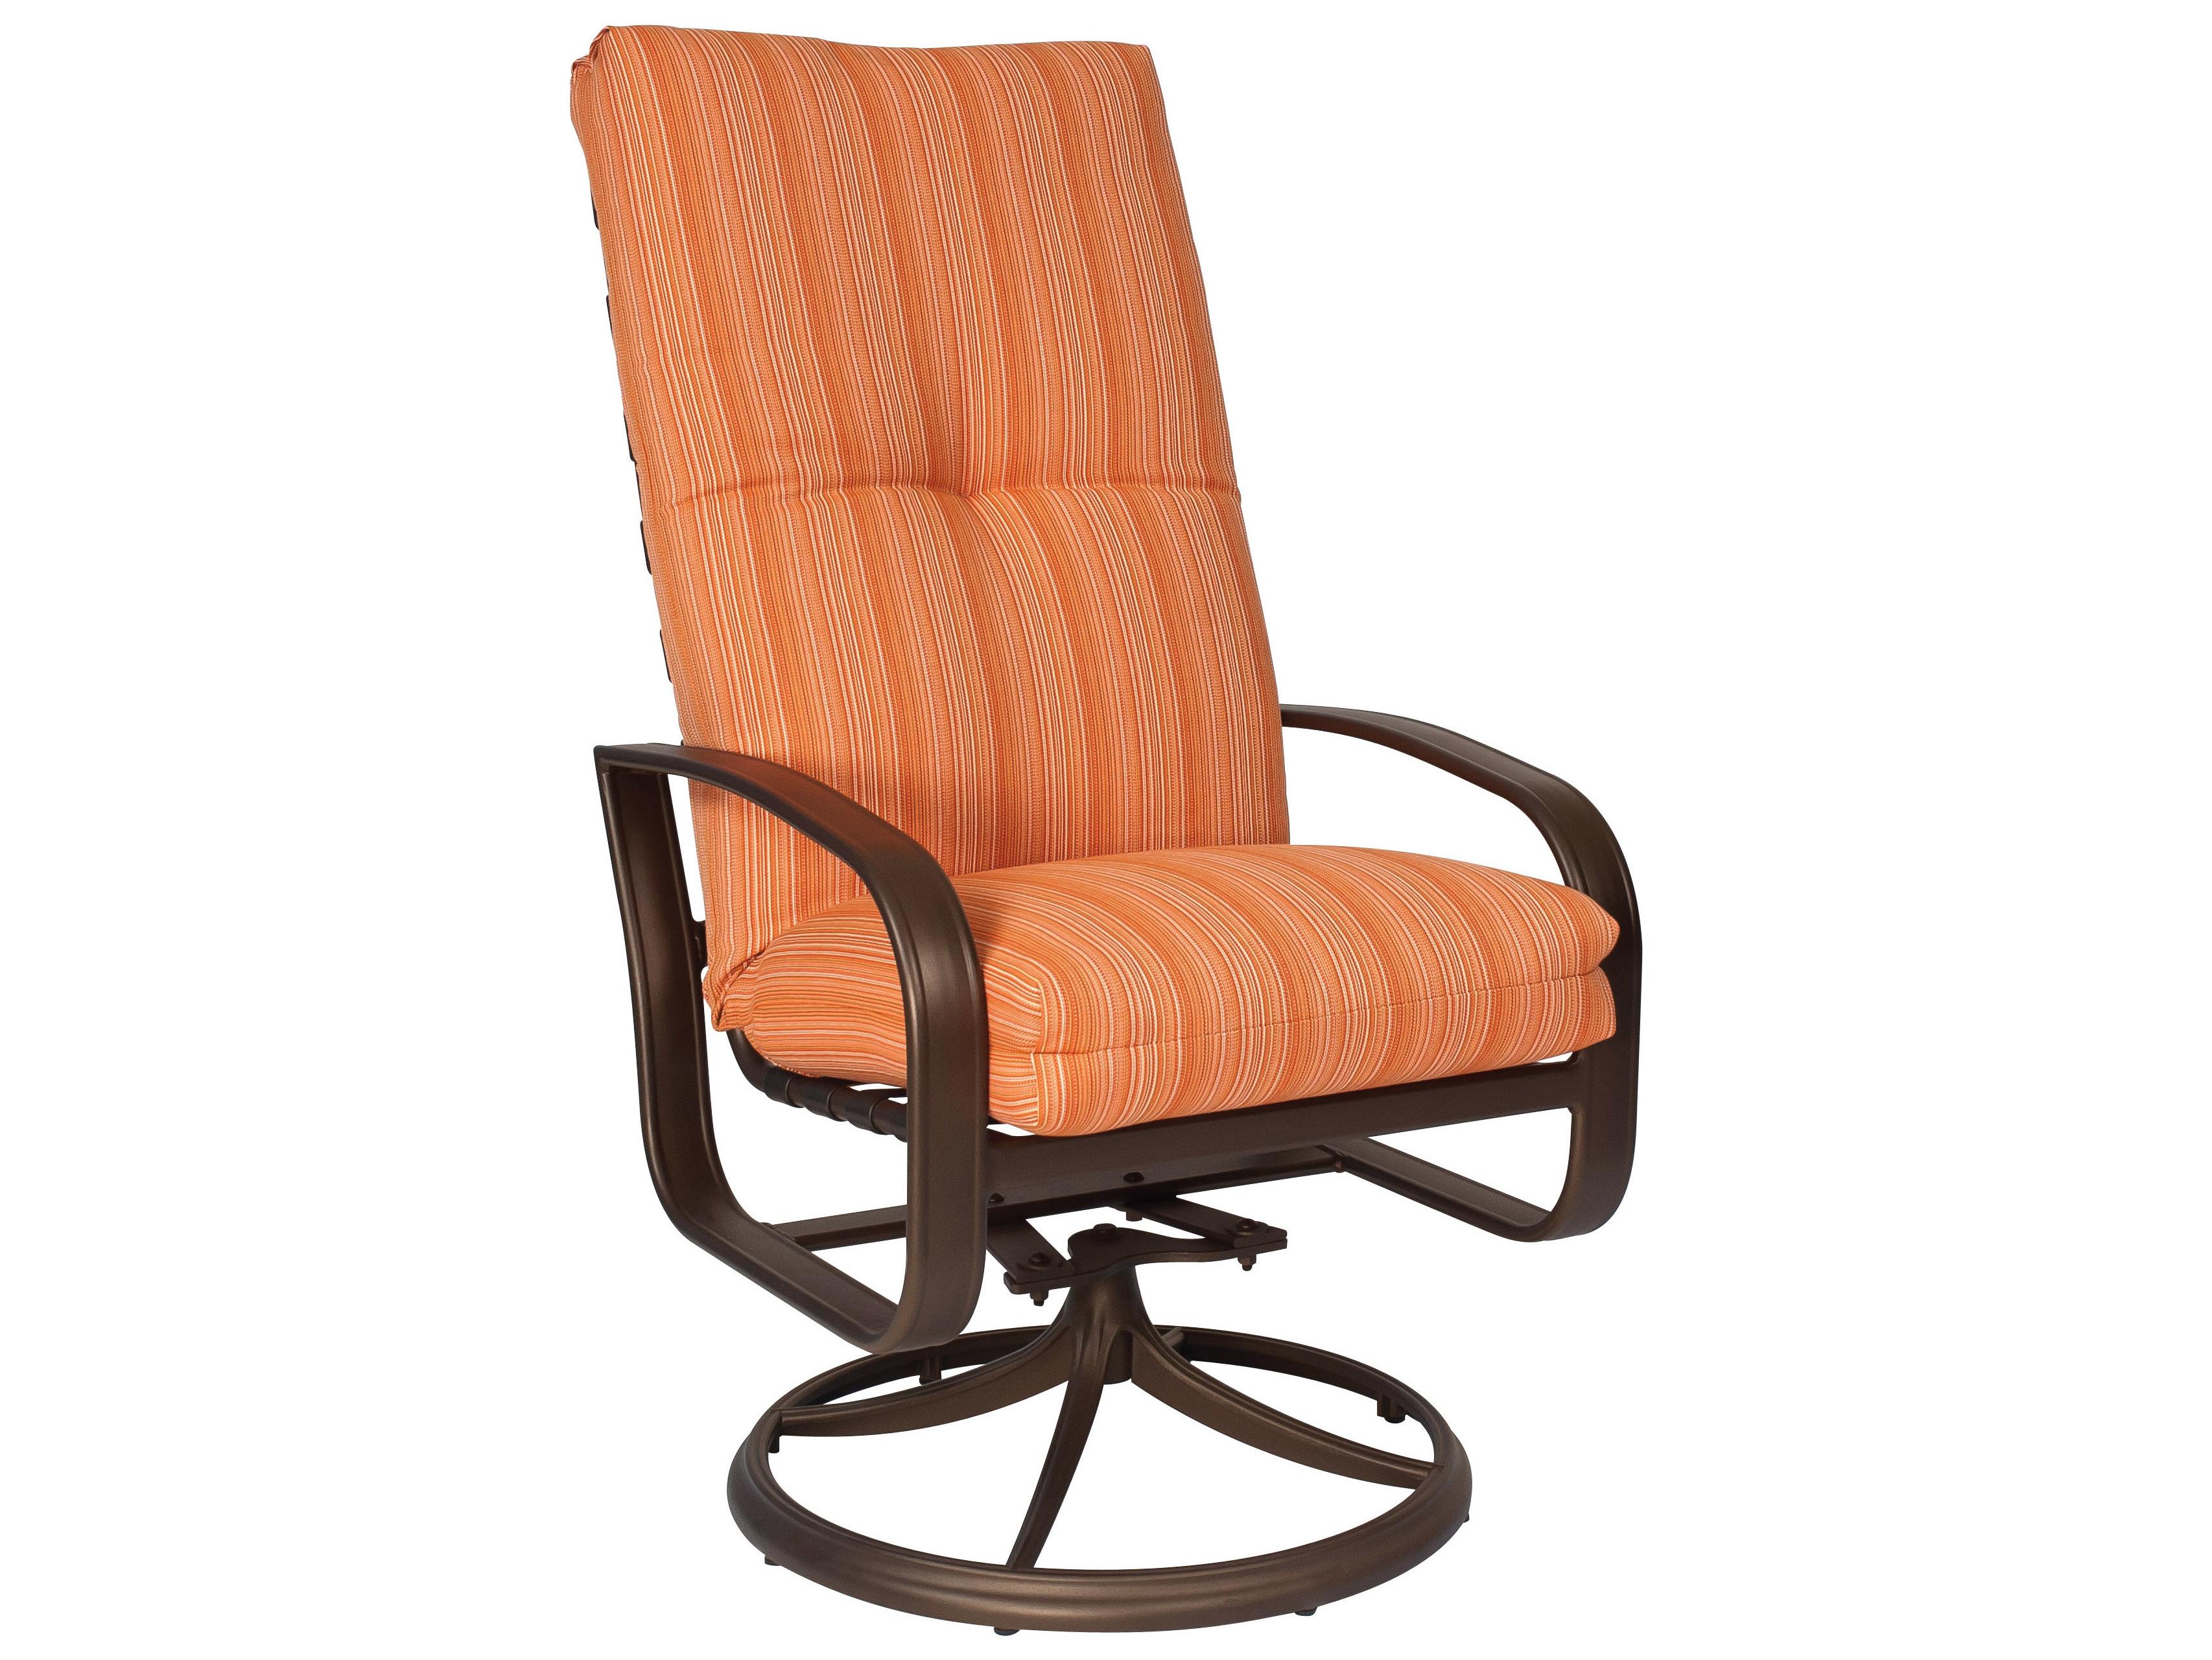 Woodard Cayman Isle High Back Swivel Rocker Chair Replacement Cushions Wr2e0488ch